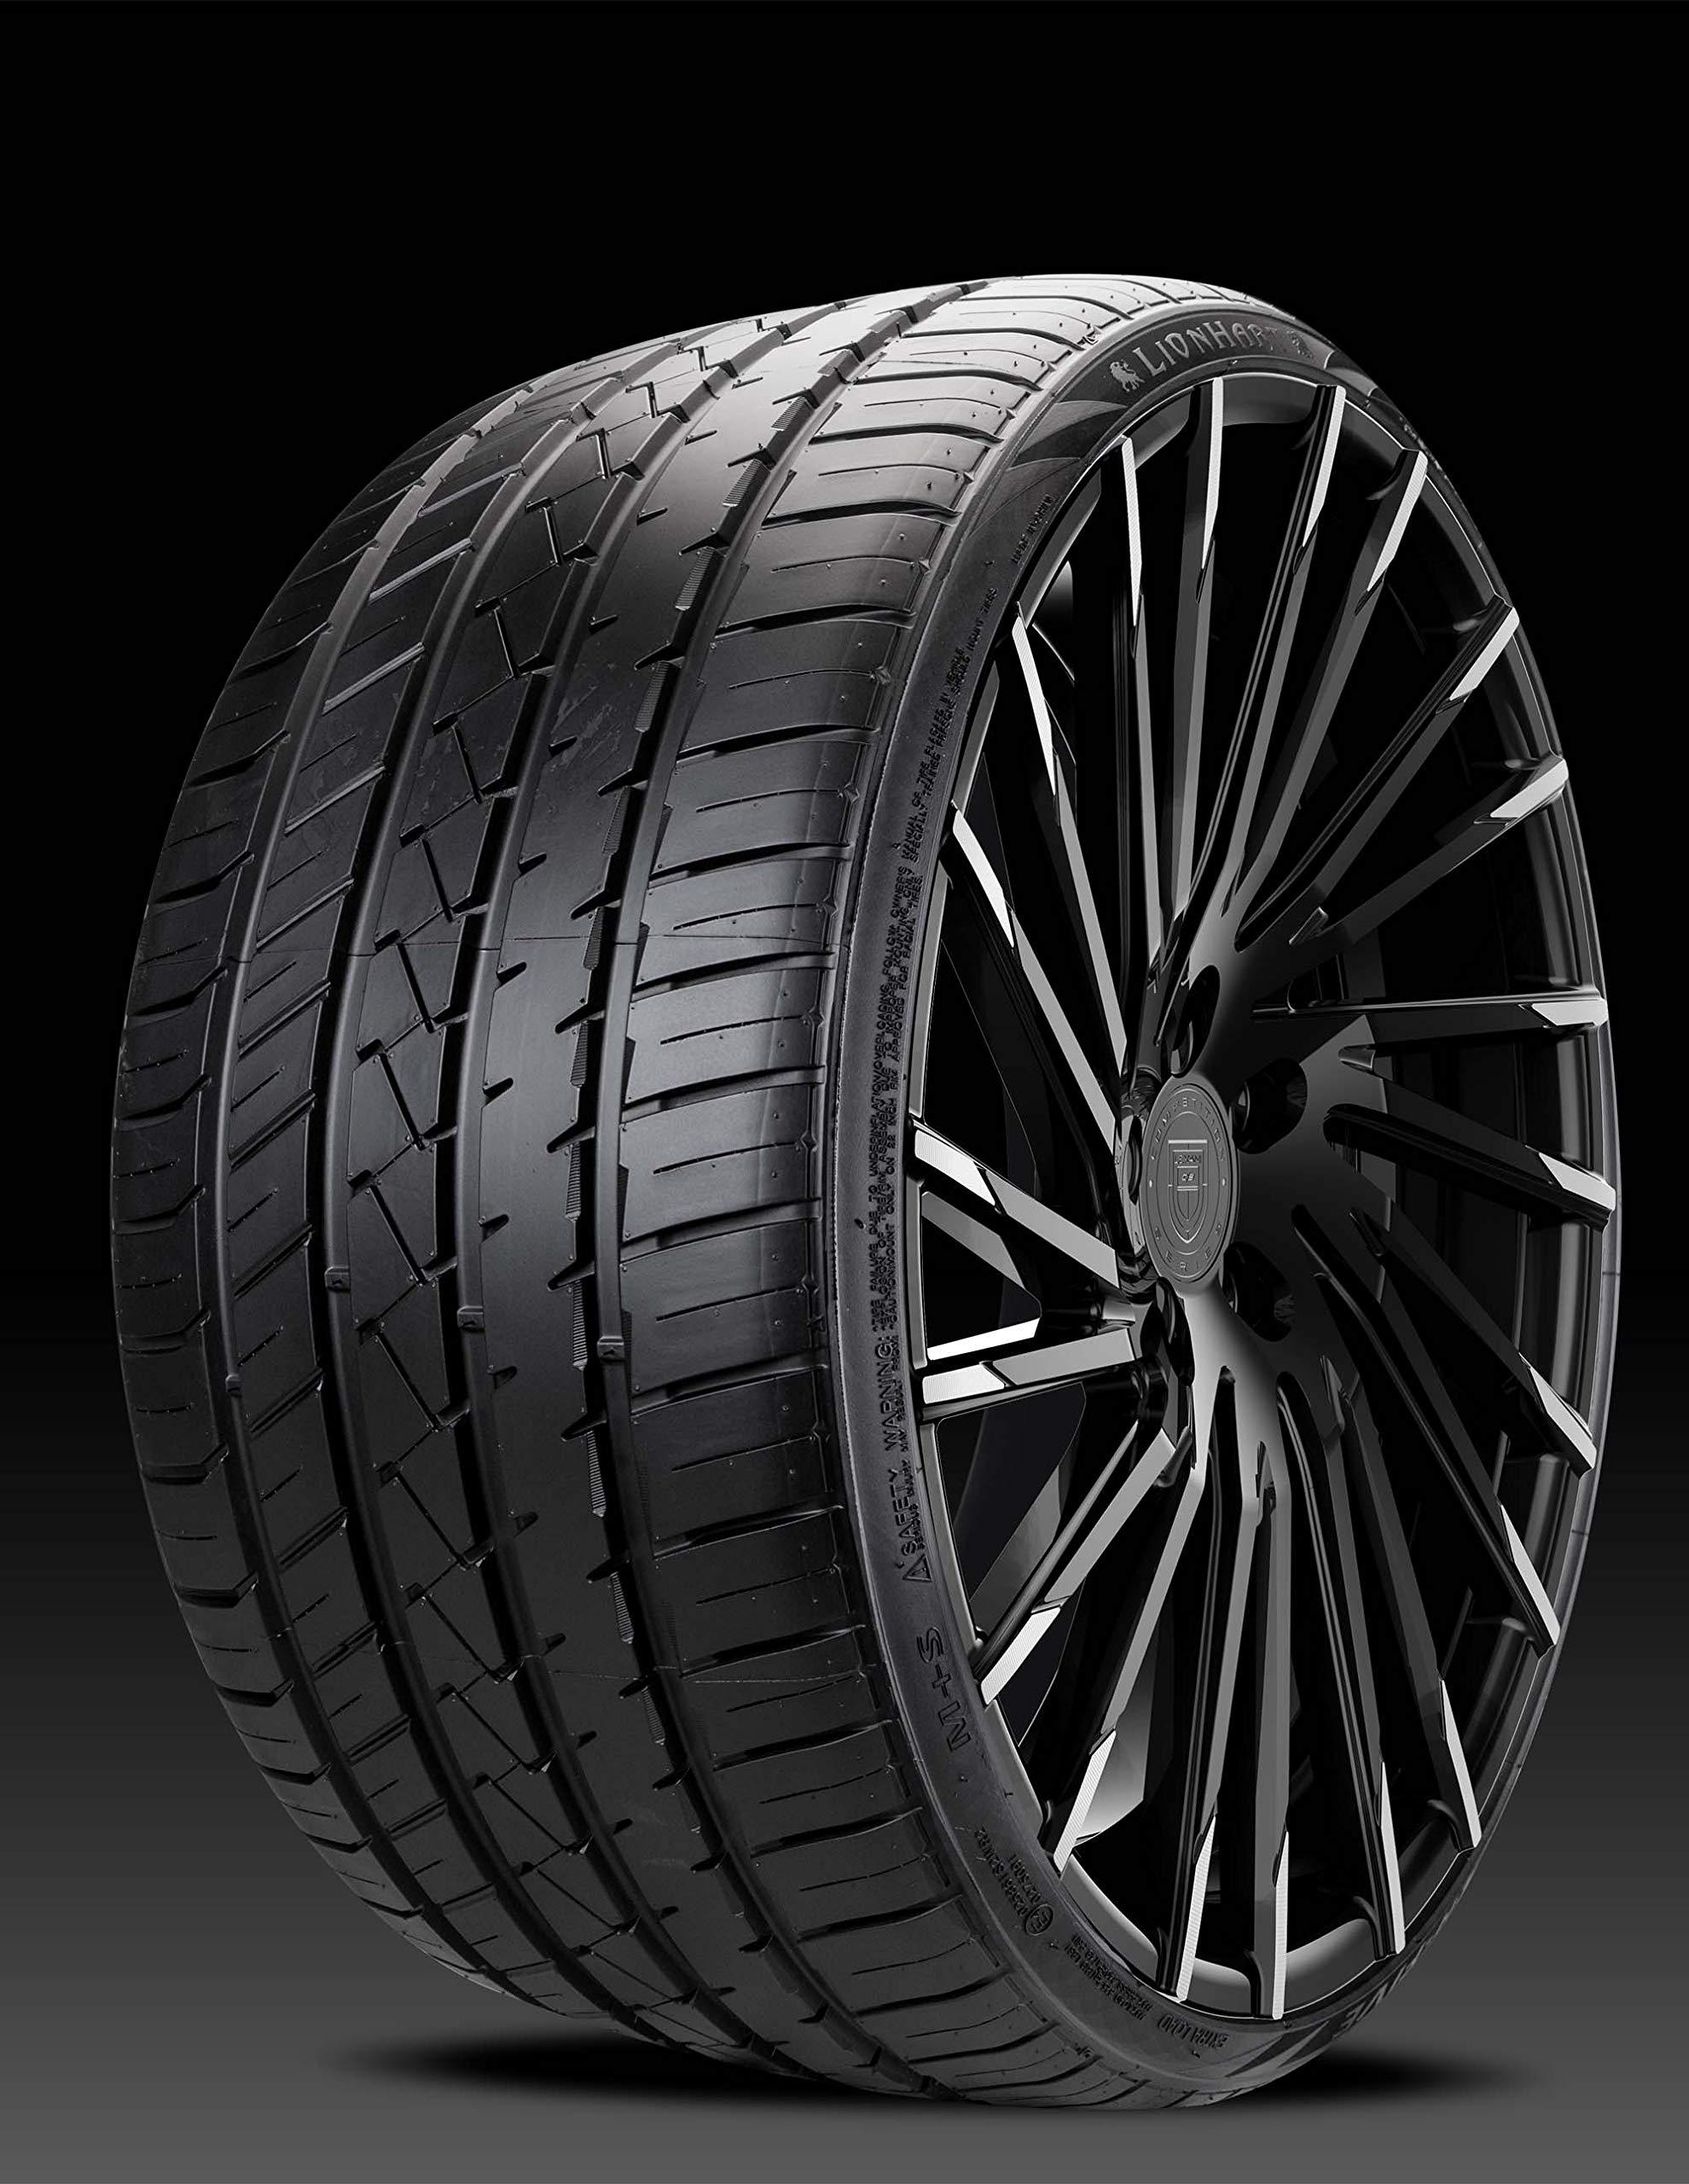 Lionhart LH-Five all_ Season Radial Tire-235/30R22 90W